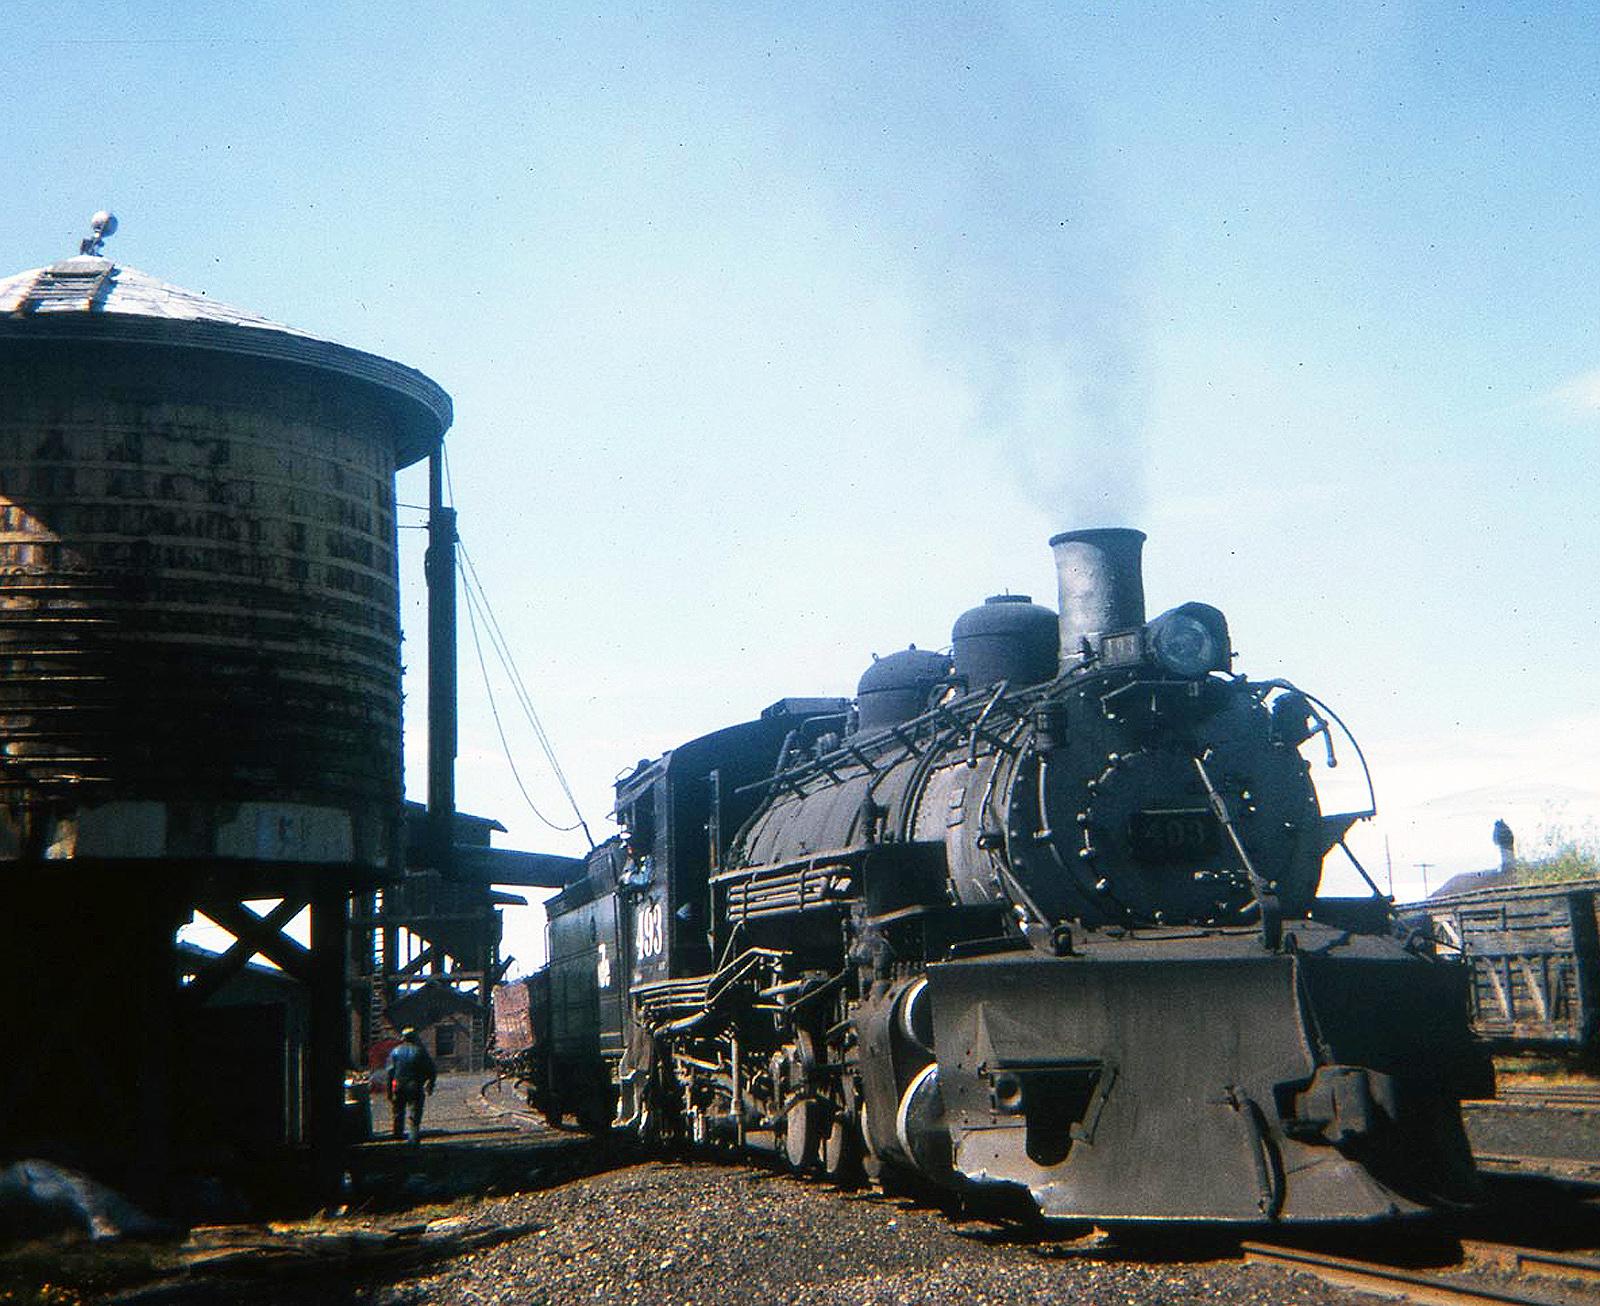 493-Chama-tank-12-6-5-68-98crop.jpg